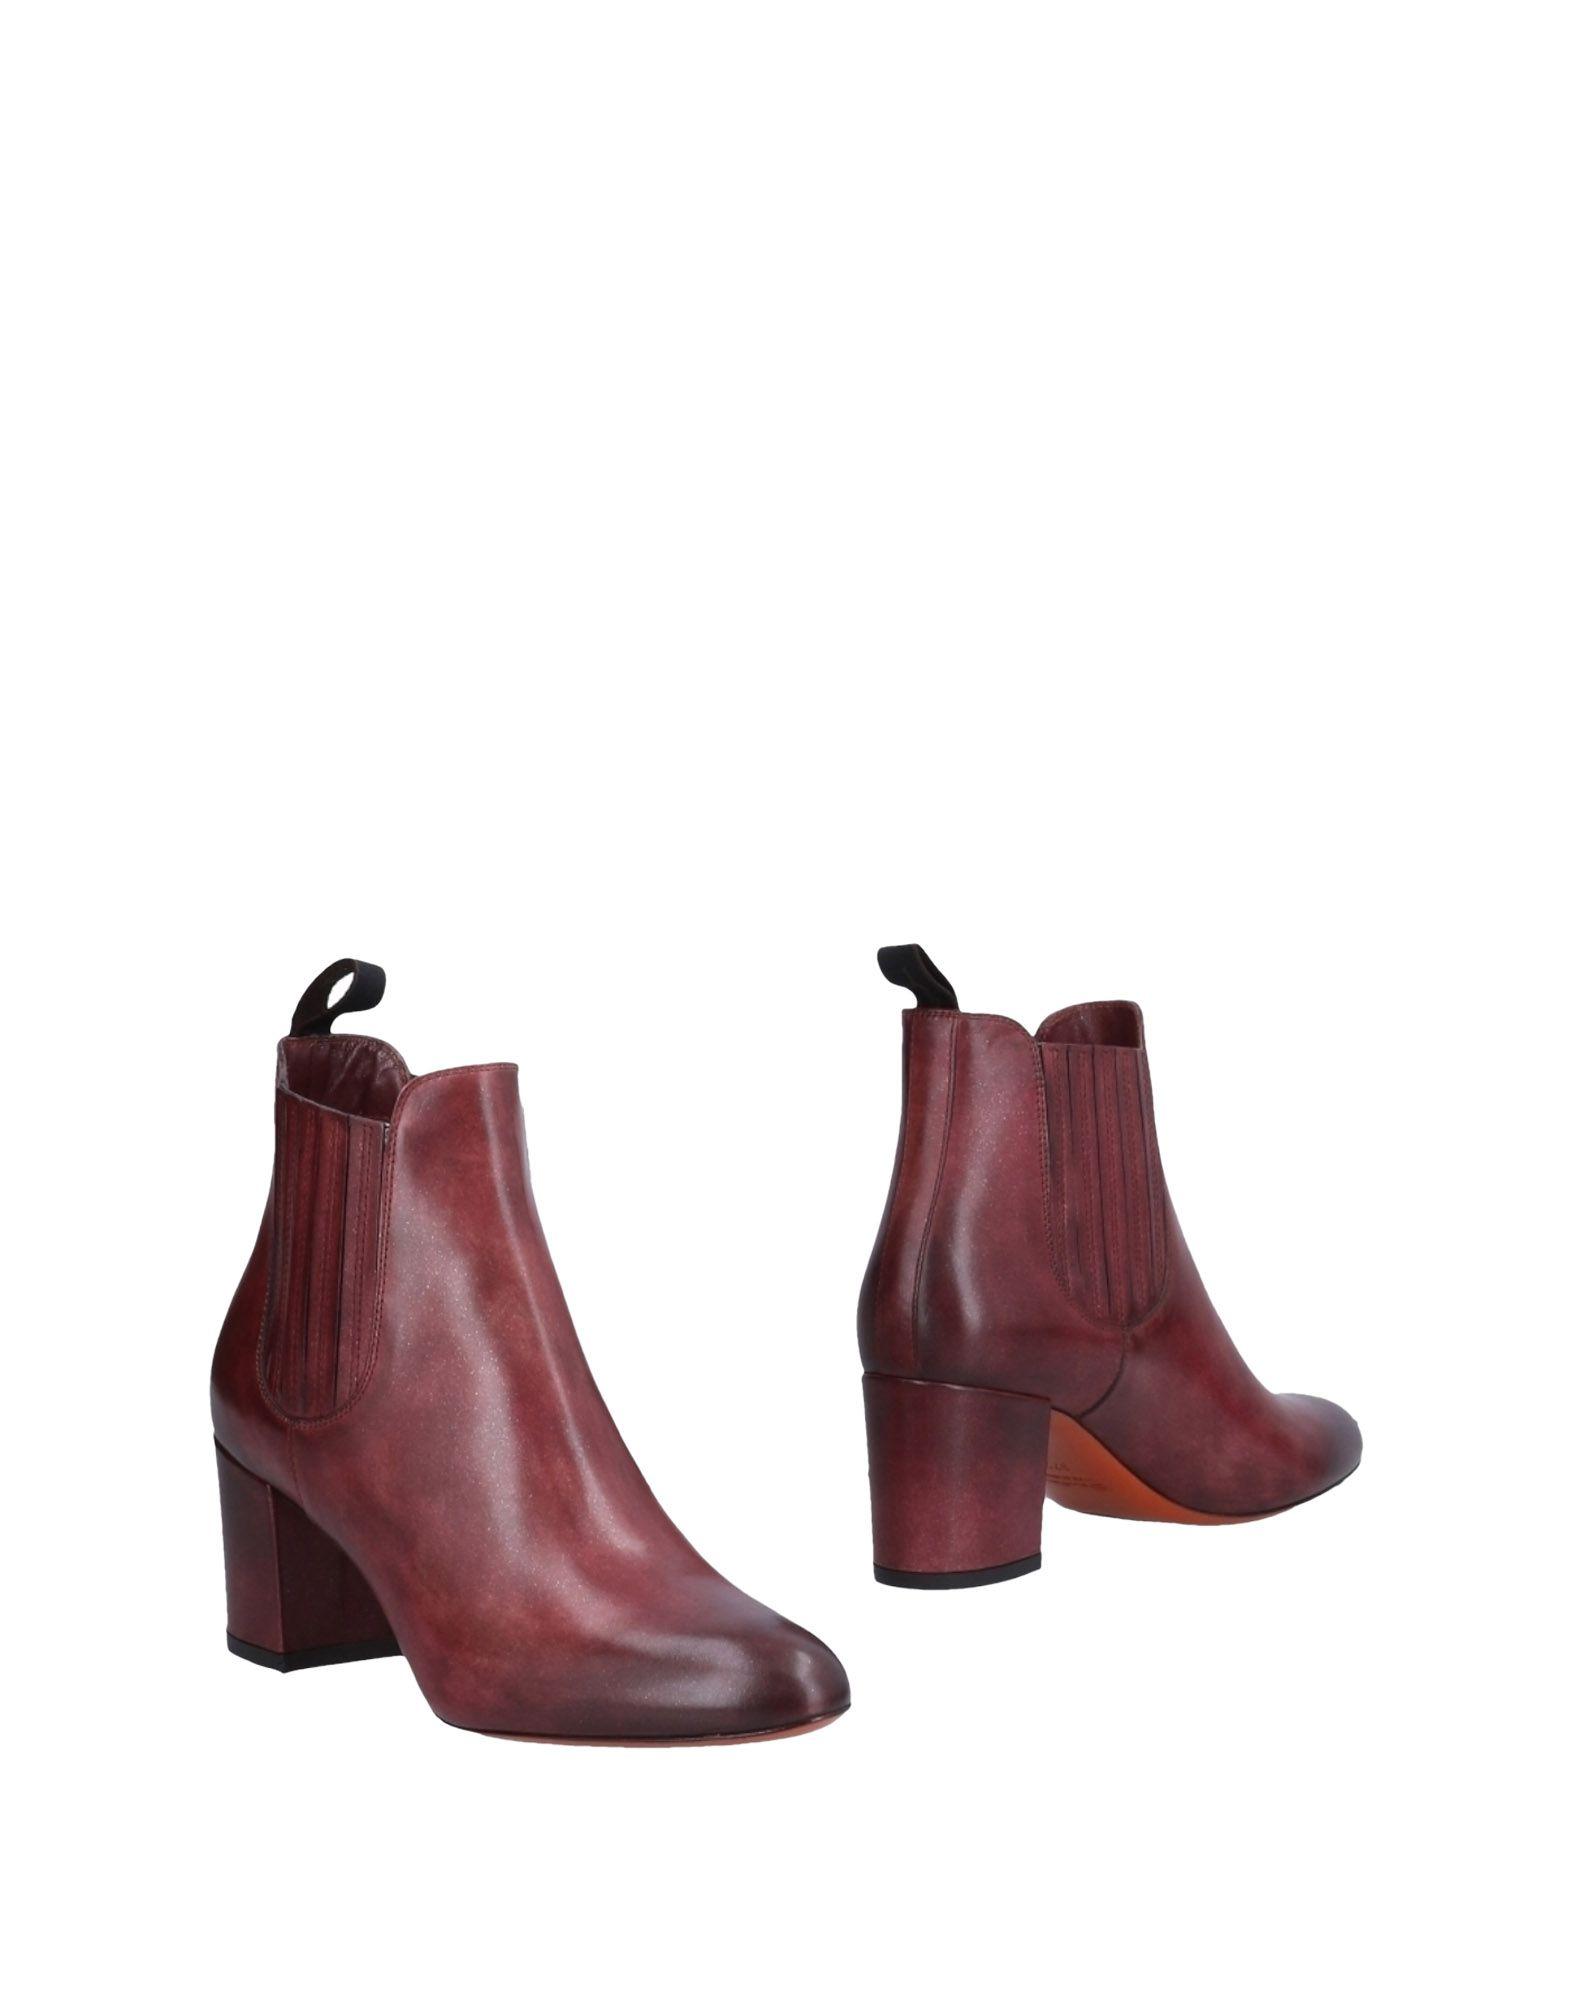 Bottine Santoni Femme - Bottines Santoni Pourpre Chaussures casual sauvages